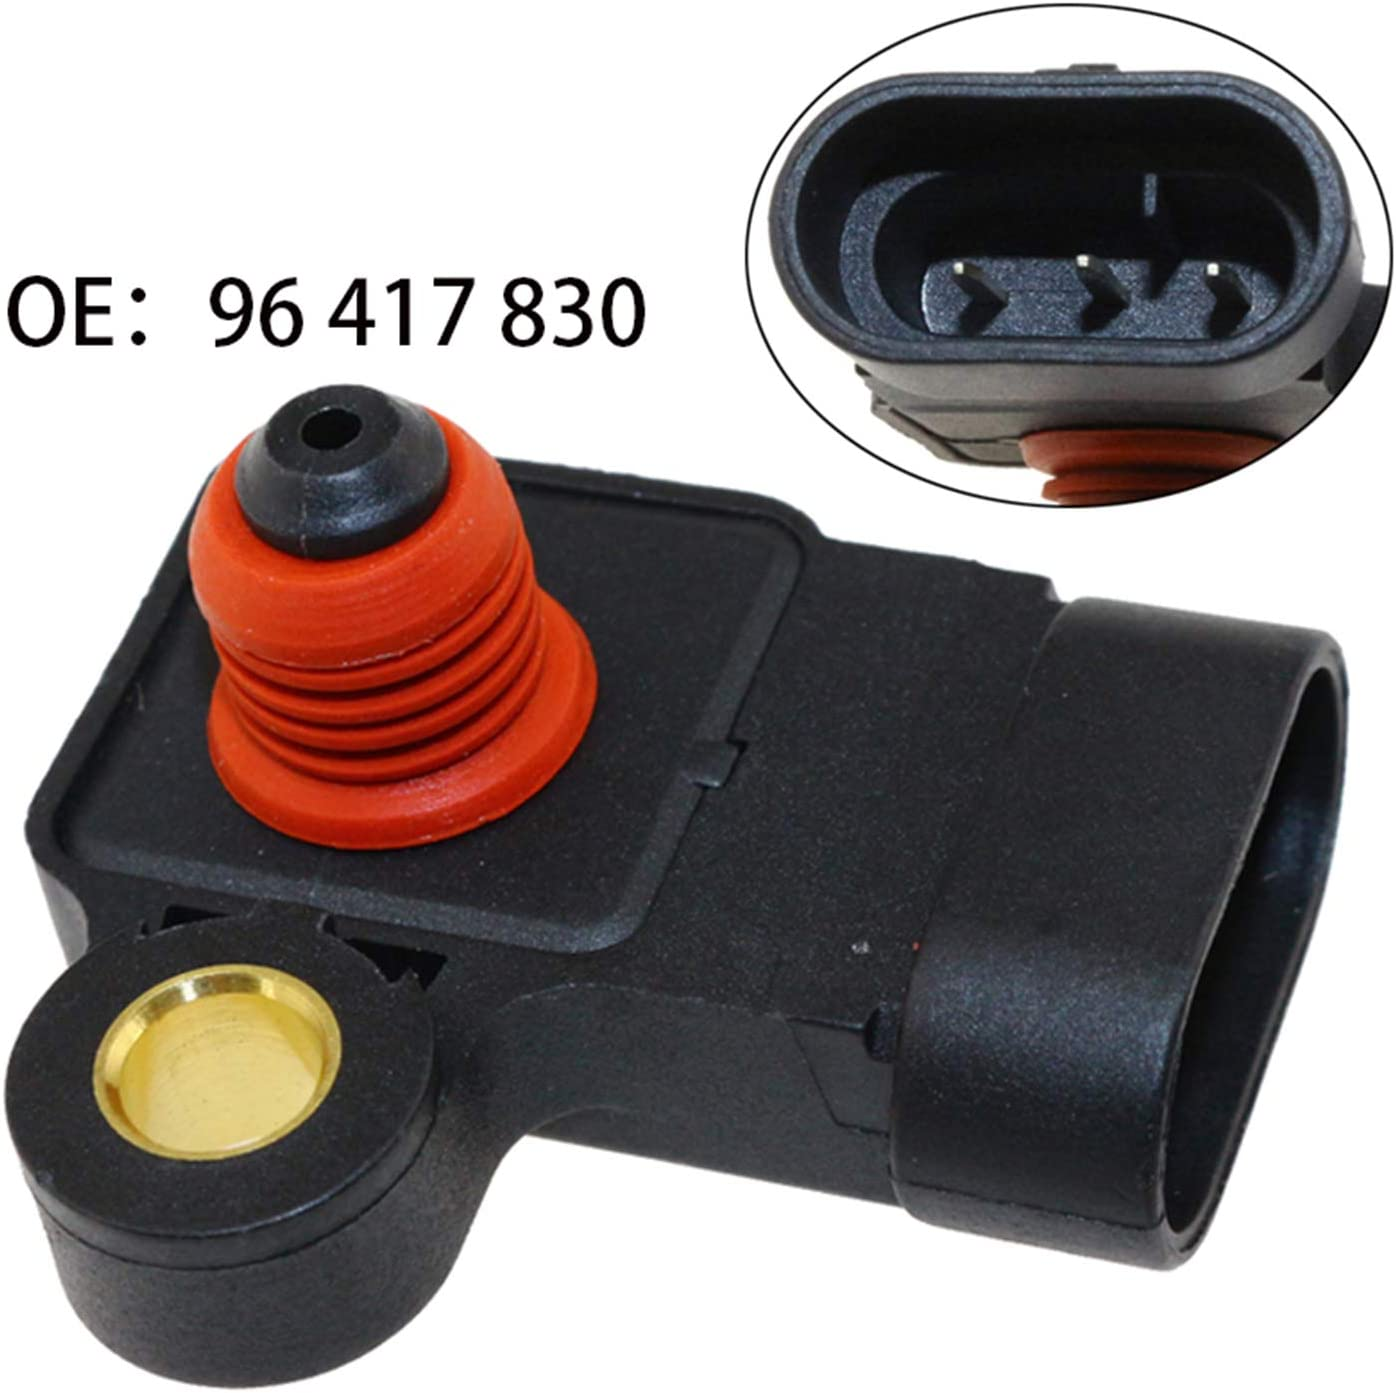 HiSport Manifold Absolute Pressure MAP Sensor 96417830 Compatible with Chevy Aveo Daewoo Nubira Lacetti Kalos